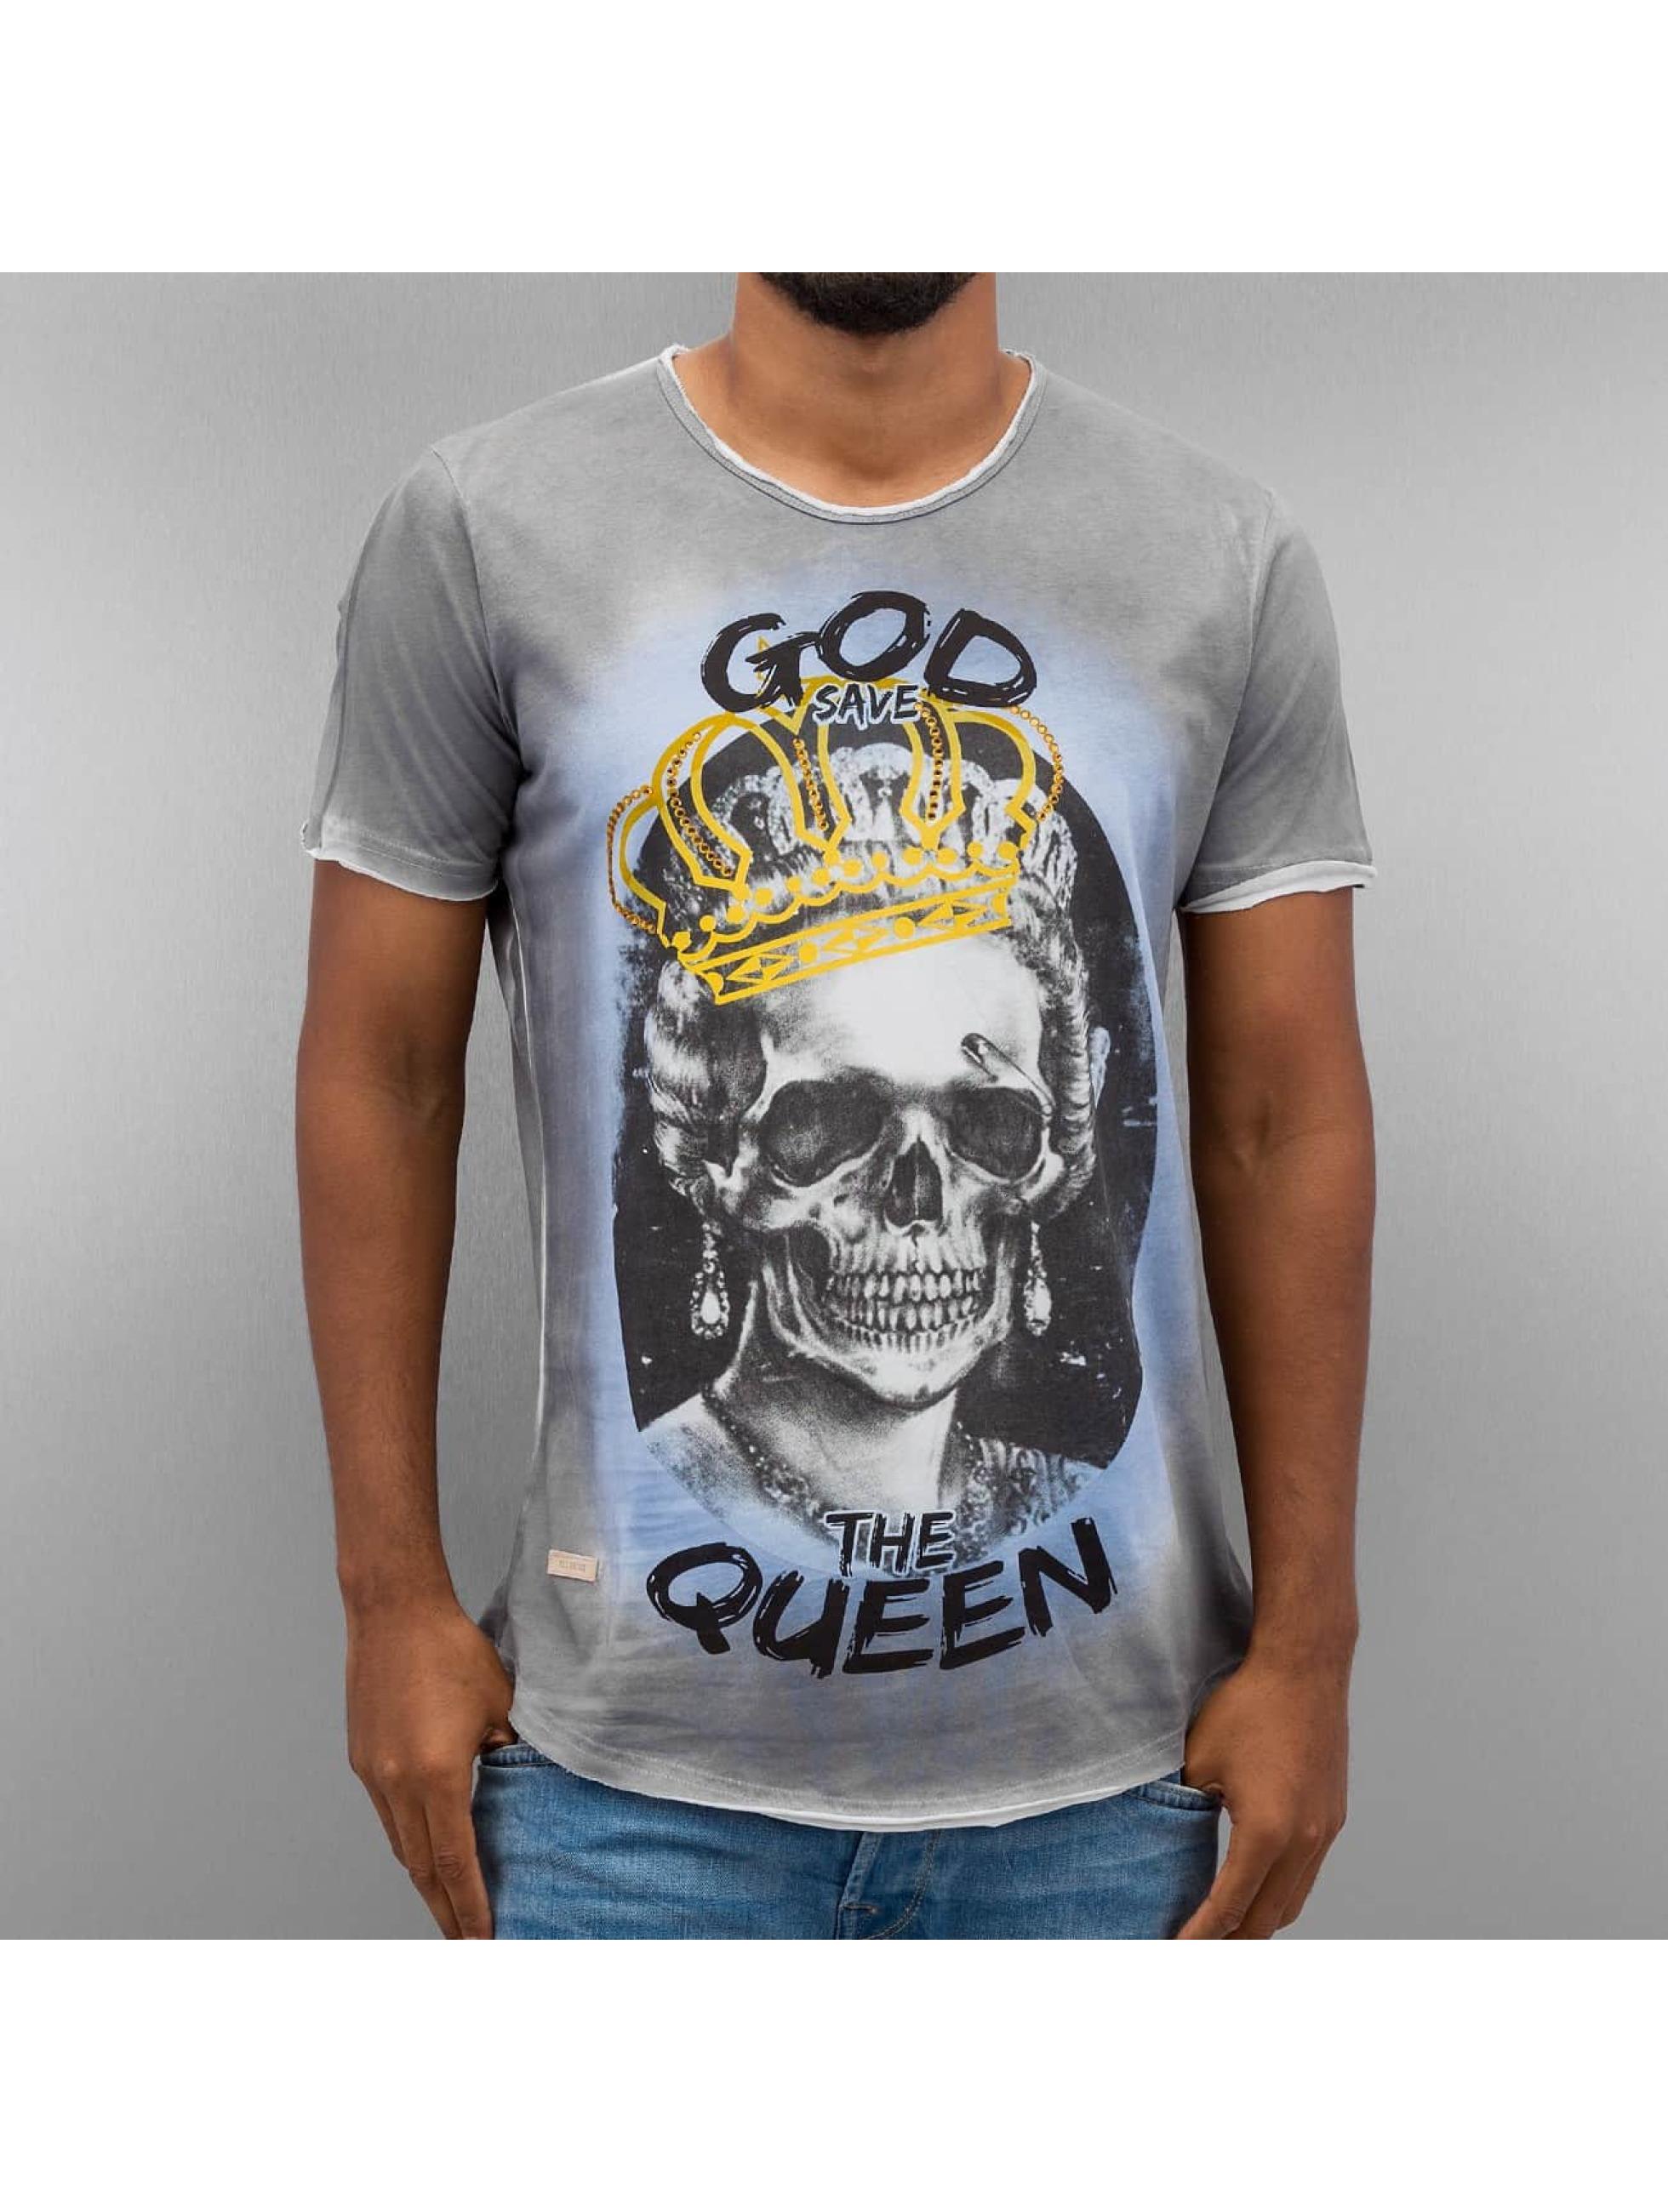 Red-Bridge-Uomini-Maglieria-T-shirt-God-Save-The-Queen